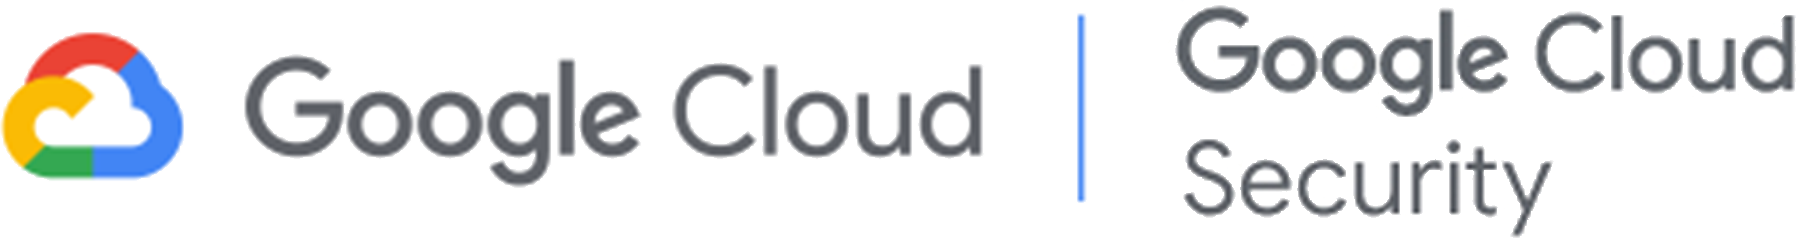 Google Cloud Security (2)